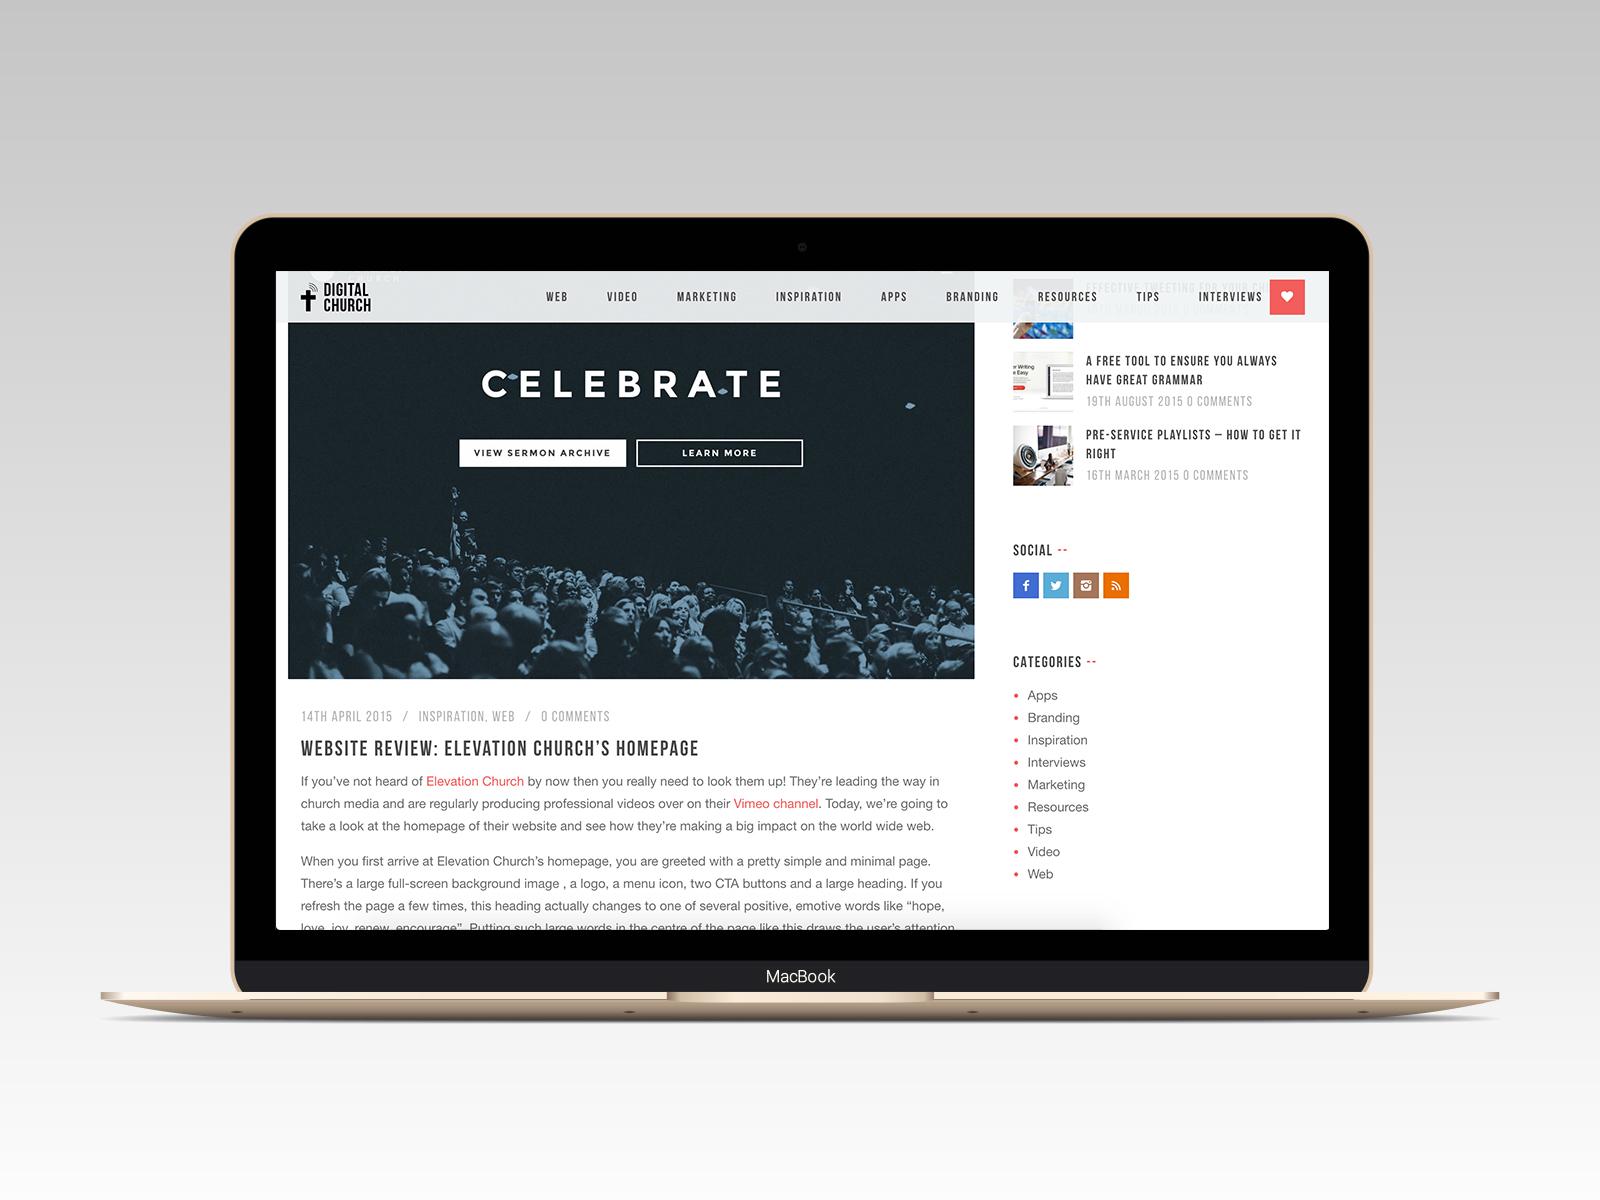 digitalchurch-macbook